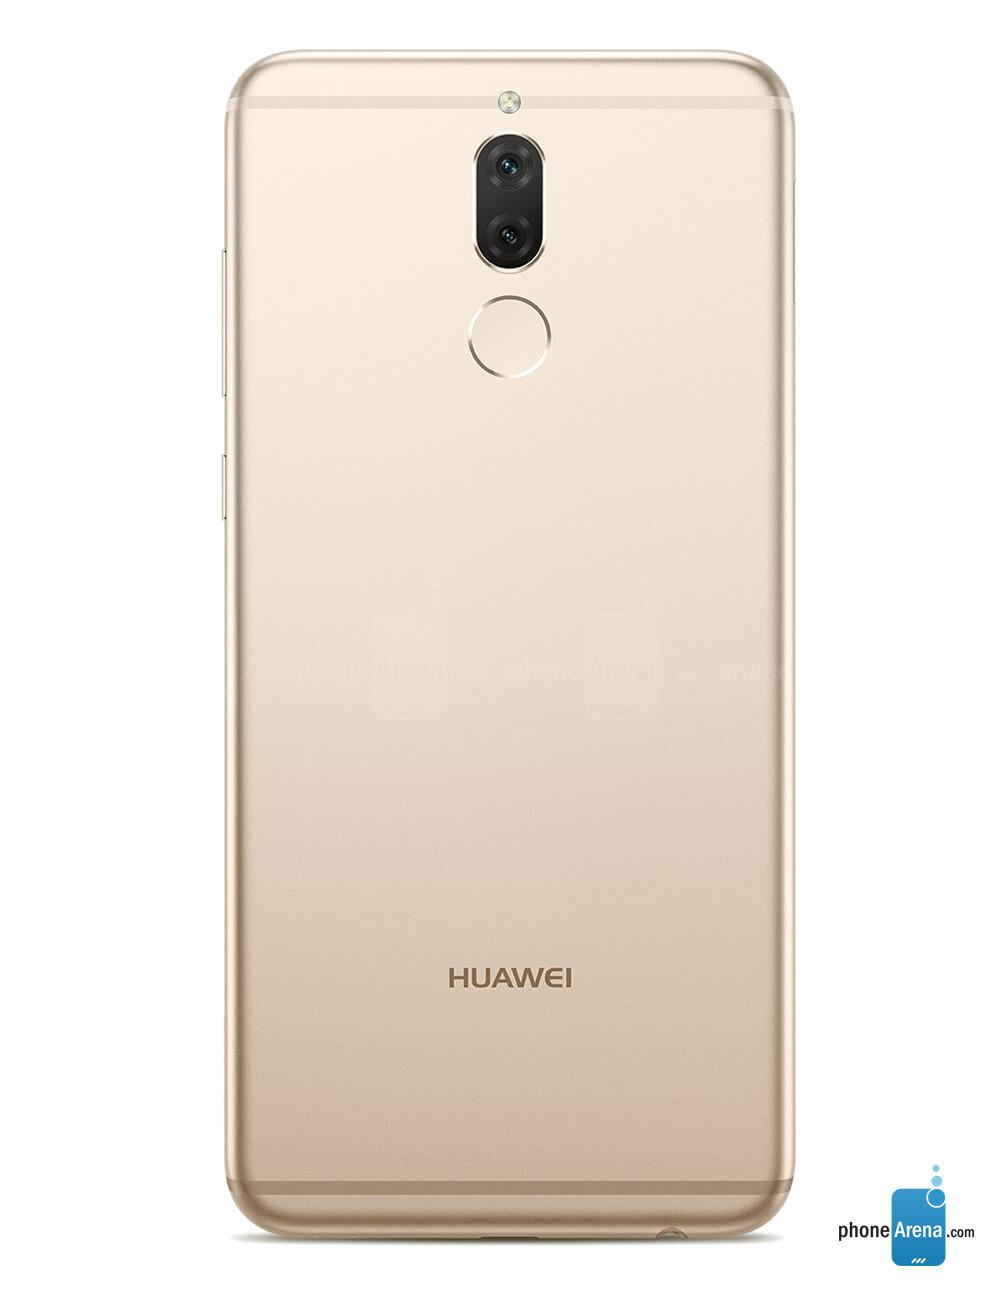 Huawei Mate 10 Lite Preis